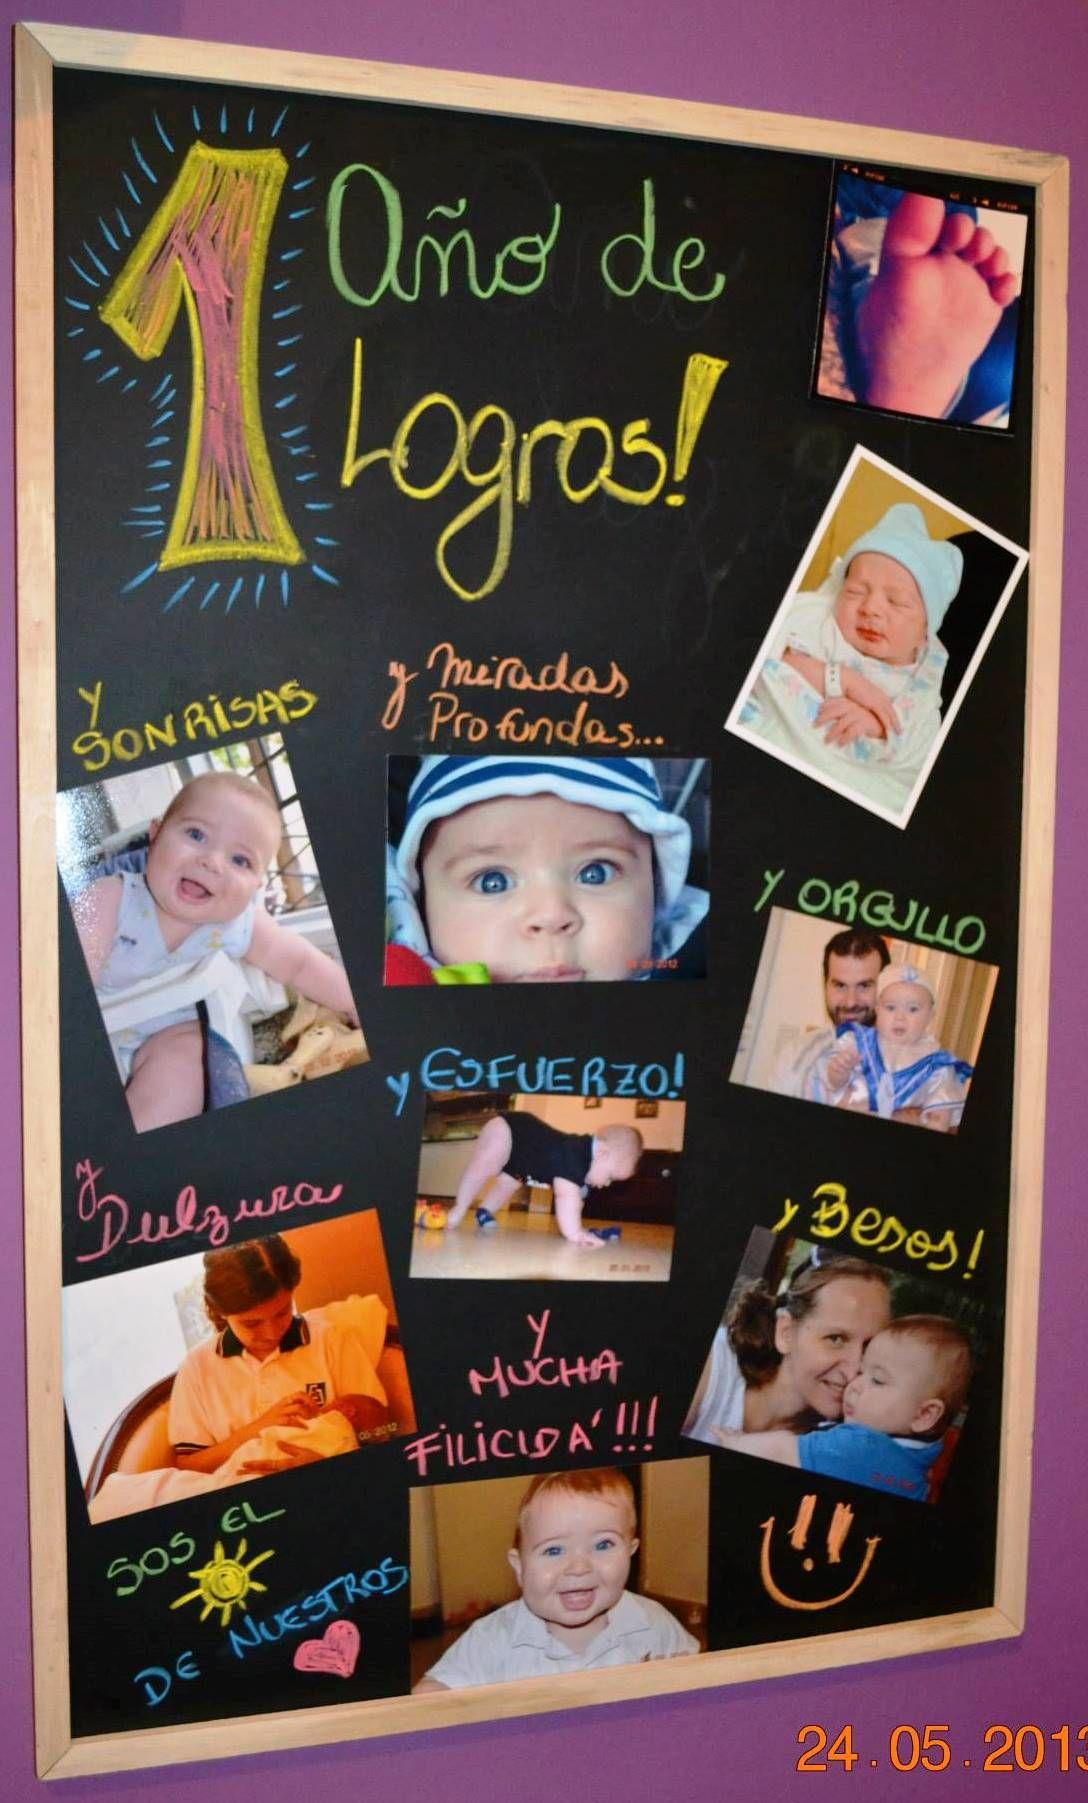 Regalo Para Mi Hija De 1 Ano.Aiden Bday Ideas Mesas De Dulces Cumpleanos Cumpleanos